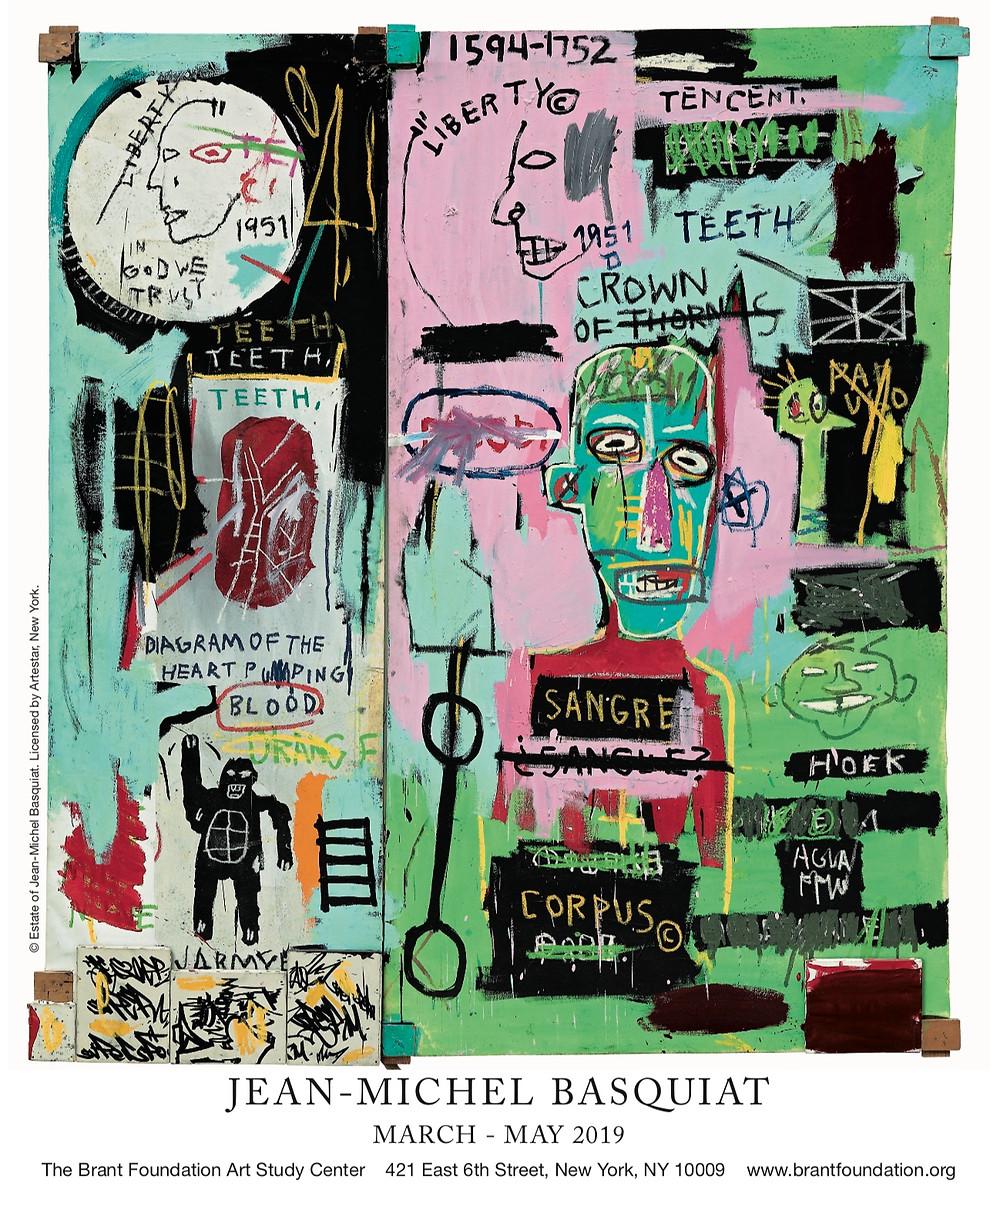 Art expert for Basquiat